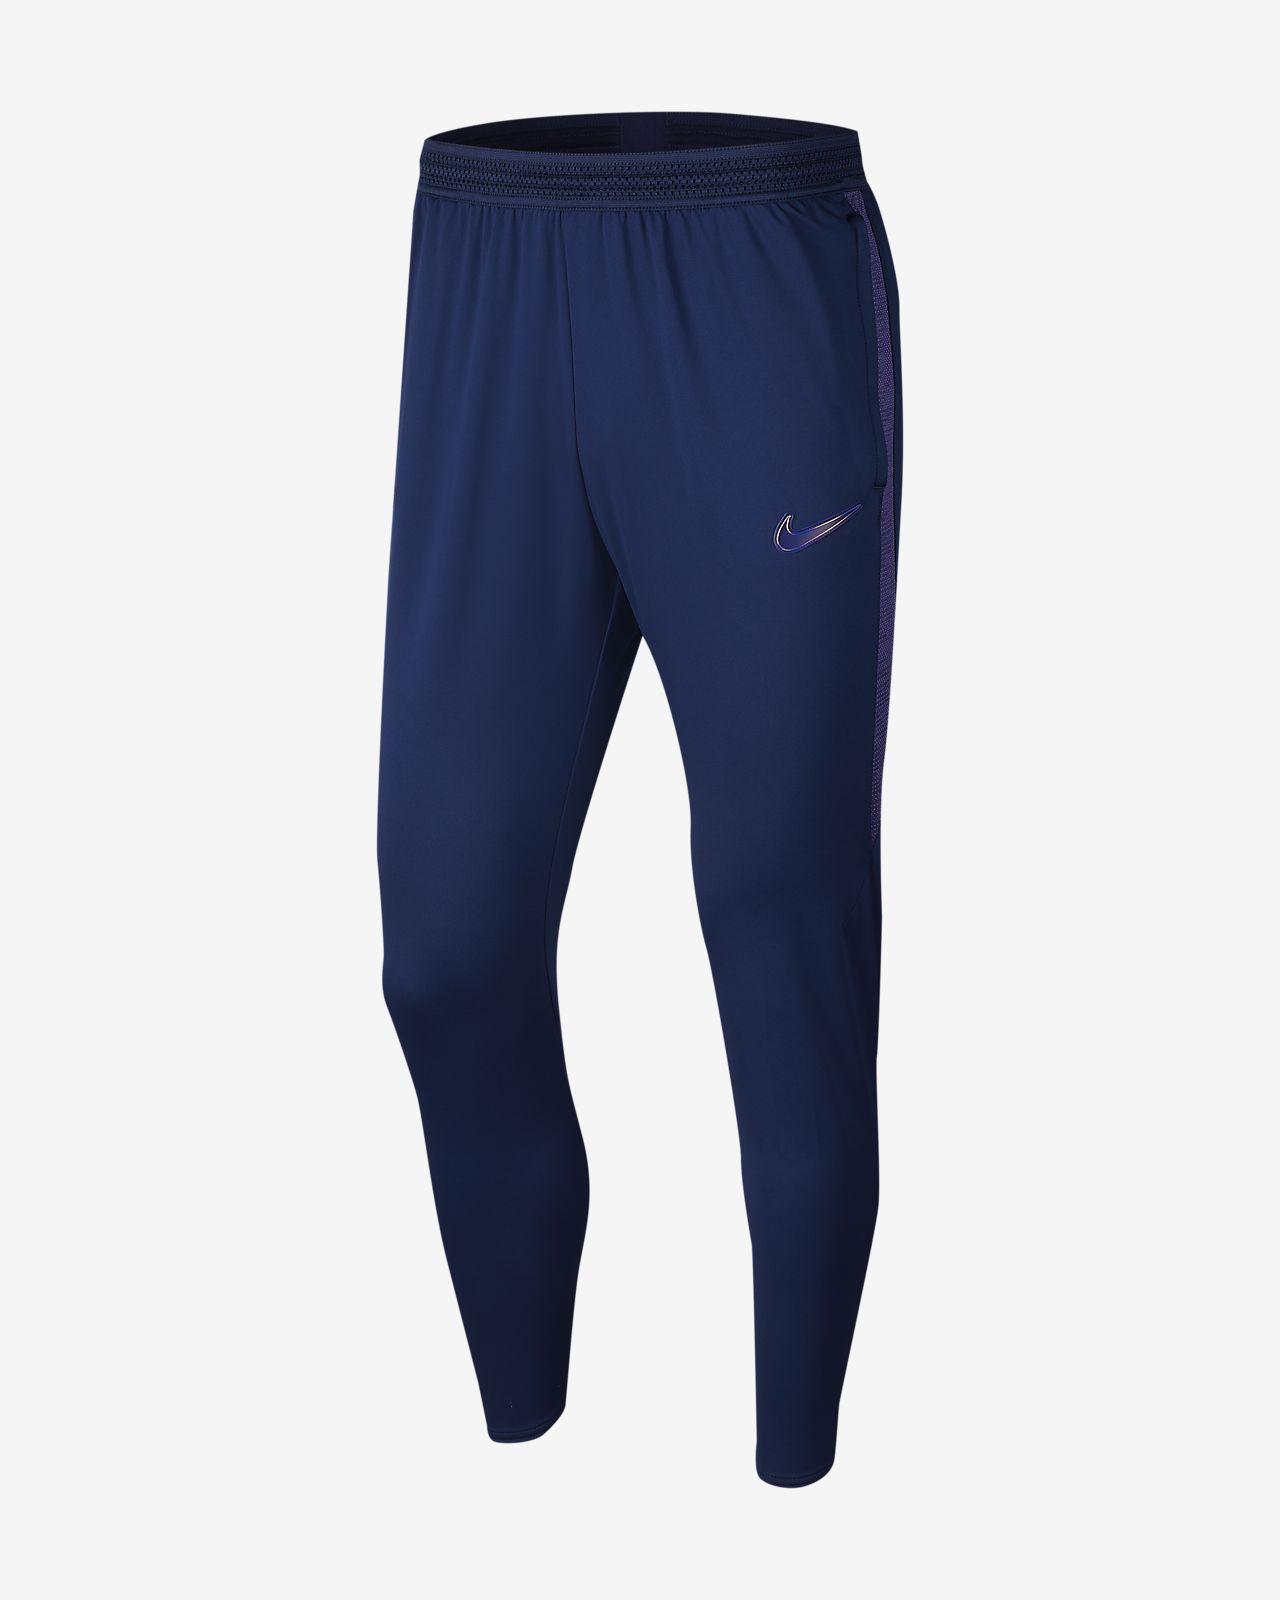 Nike Dri-FIT Tottenham Hotspur Strike Men's Football Pants